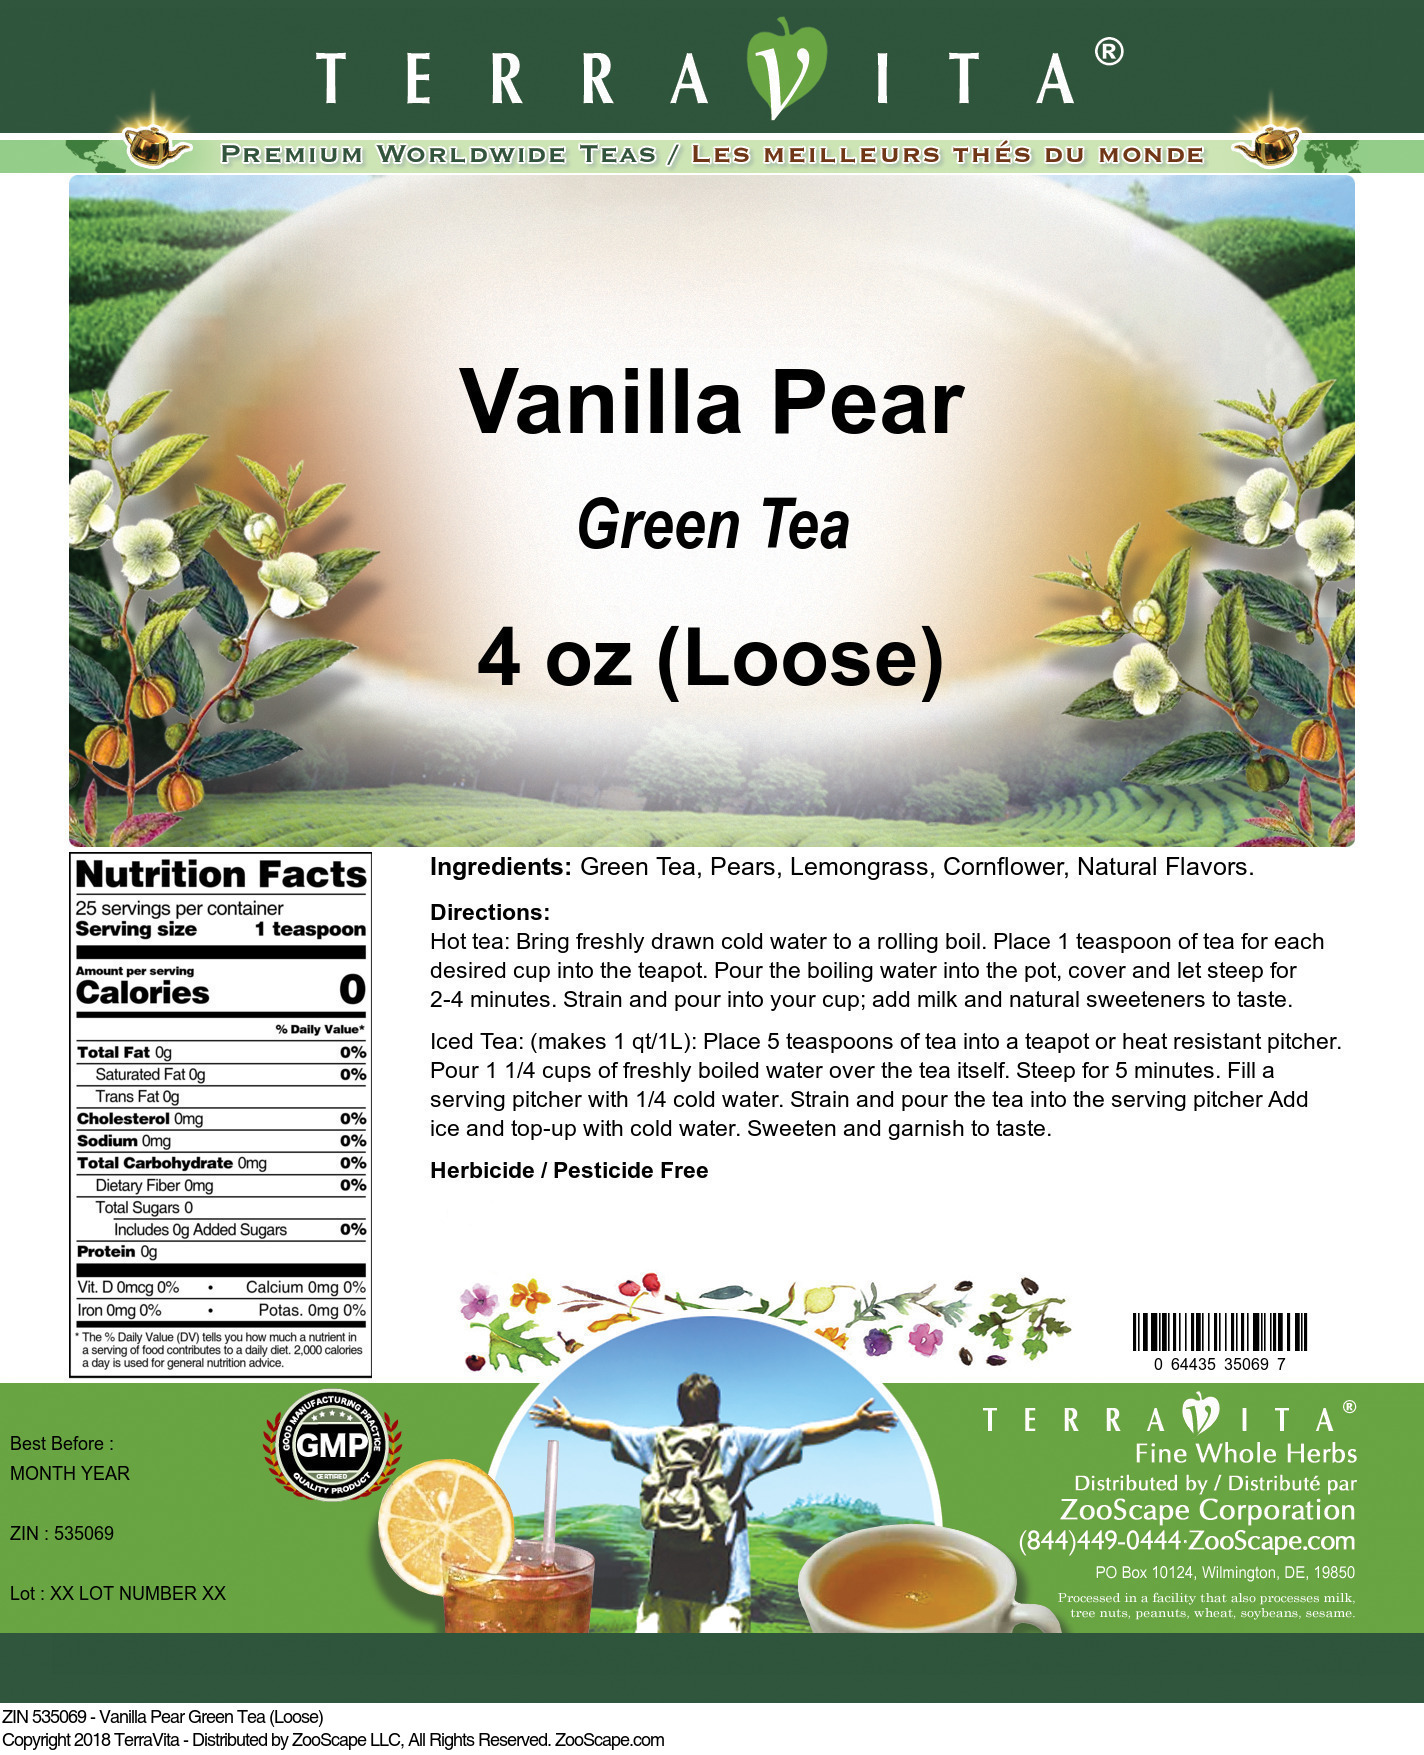 Vanilla Pear Green Tea (Loose)